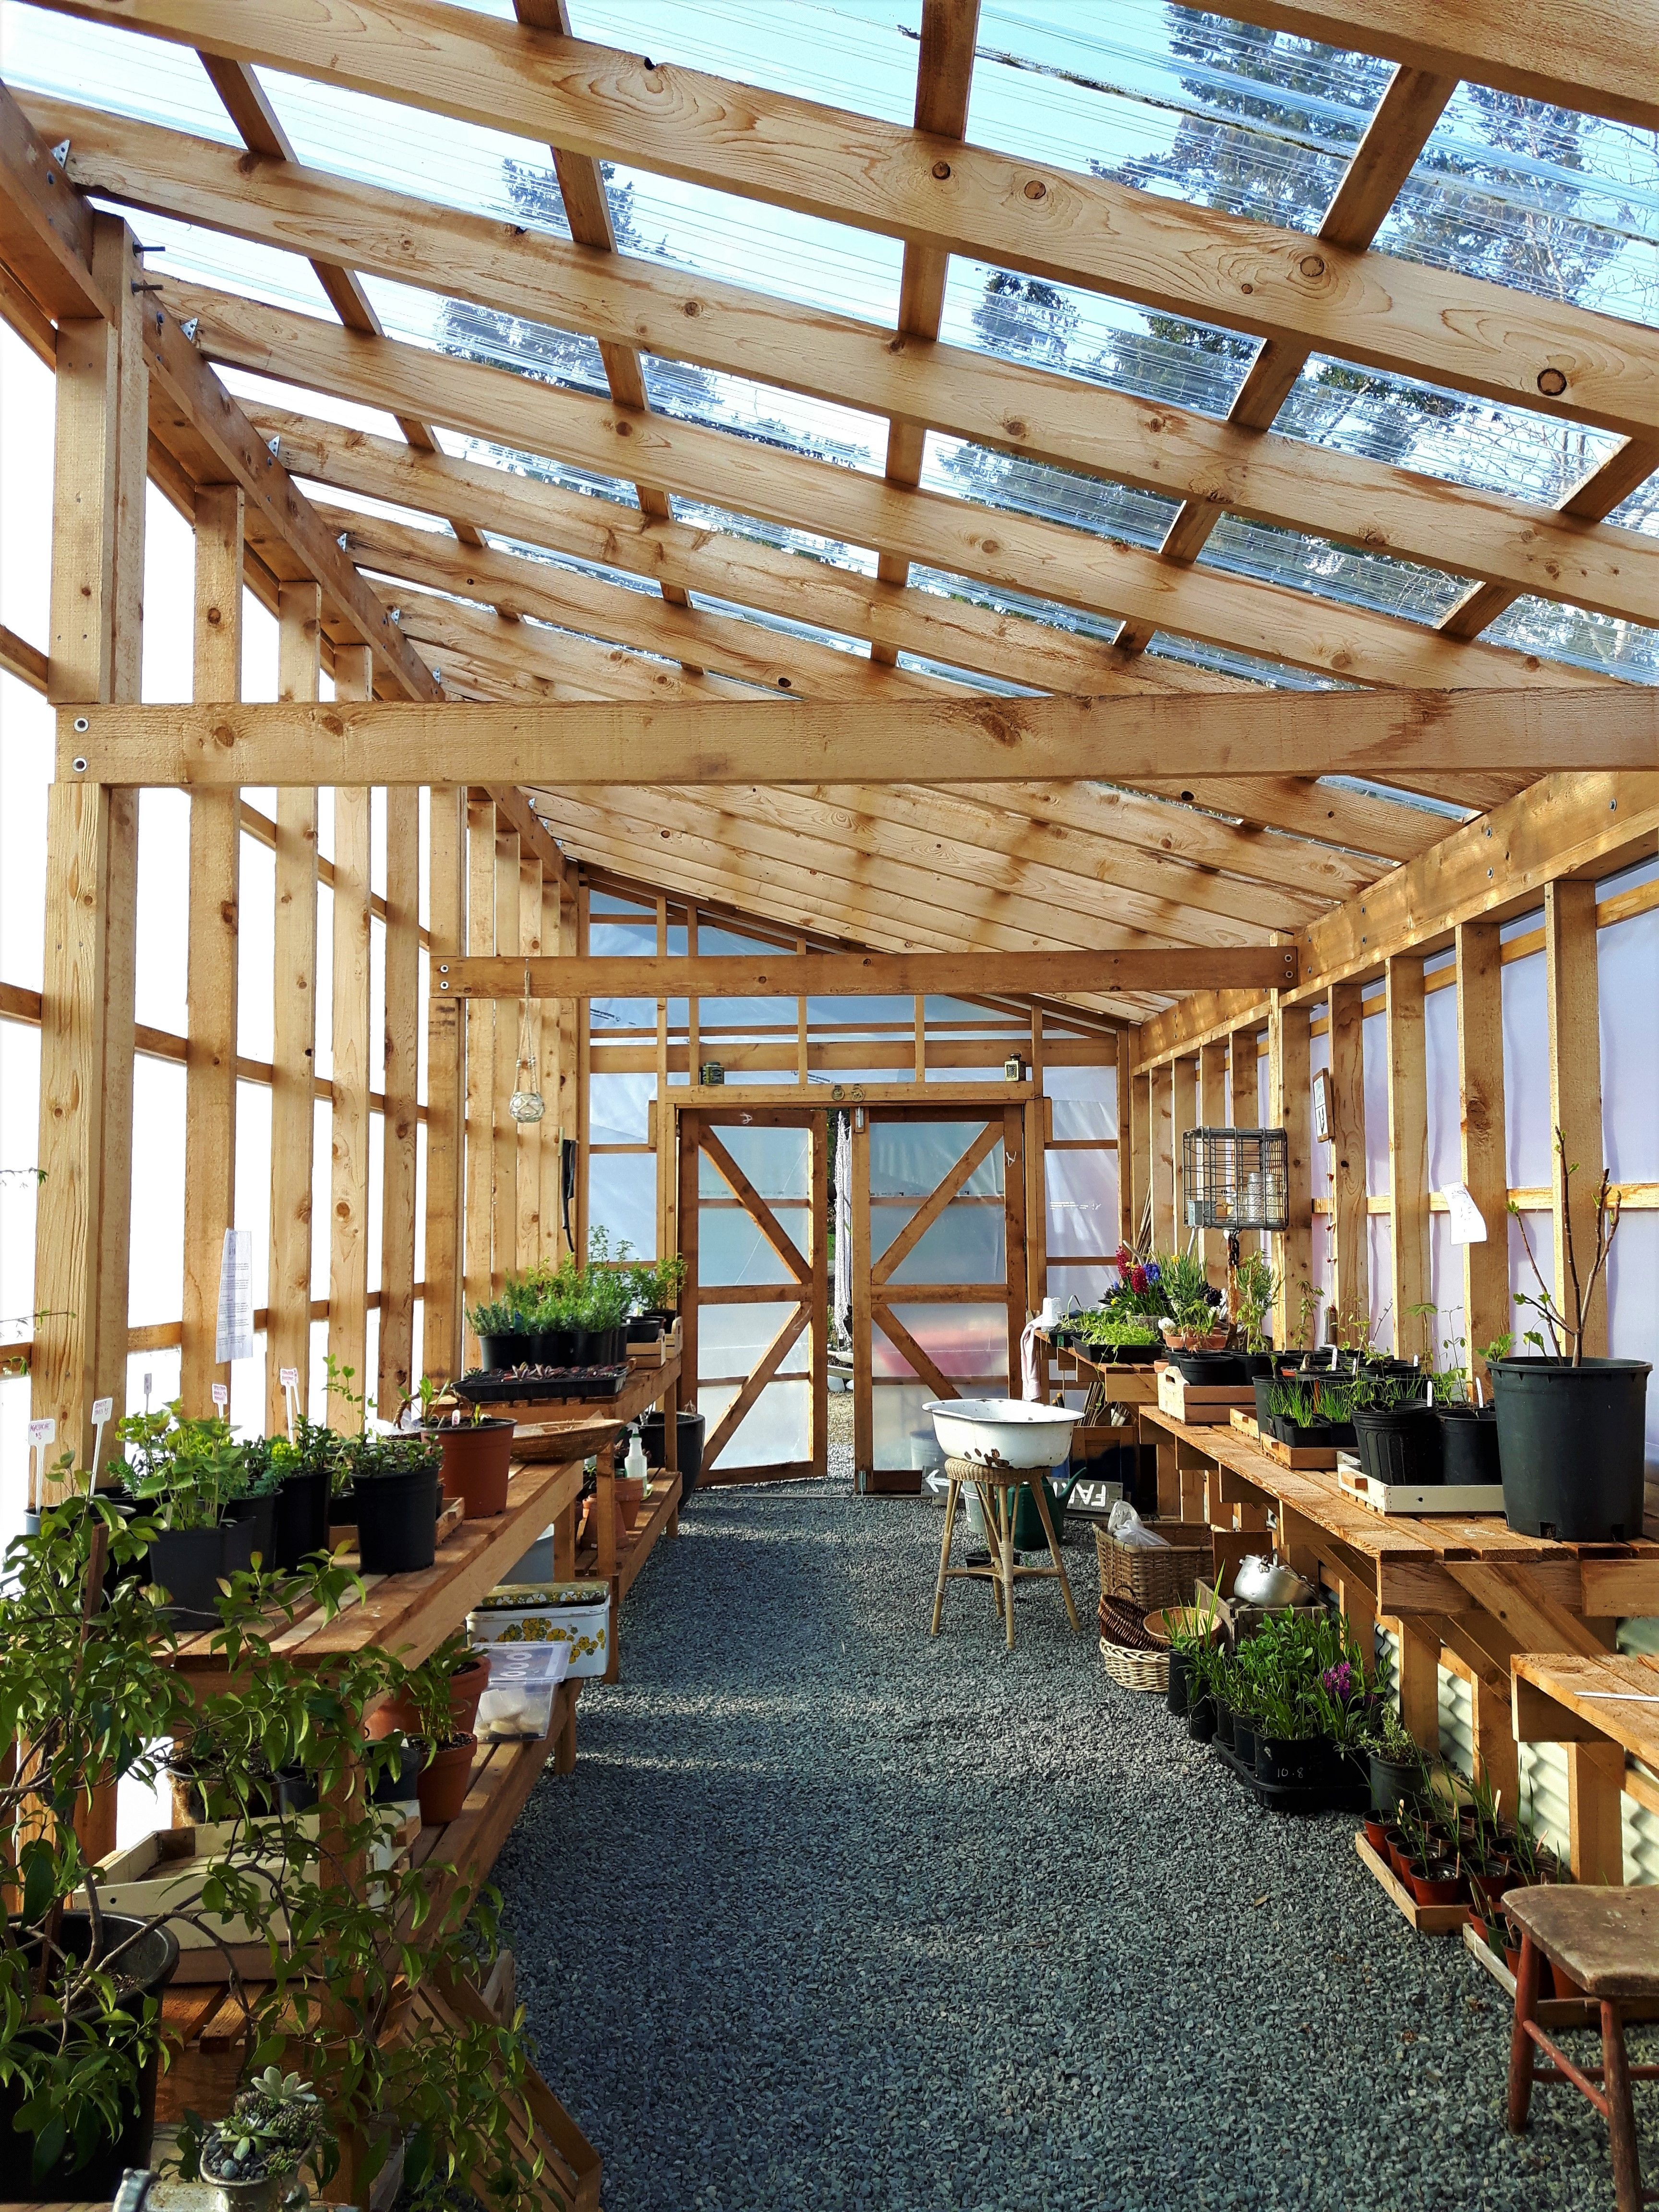 The Beautifully Designed Westcoast Style Greenhouse At Sleeping Dog Mermaid Farm In The Comox V Backyard Greenhouse Diy Greenhouse Plans Greenhouse Gardening